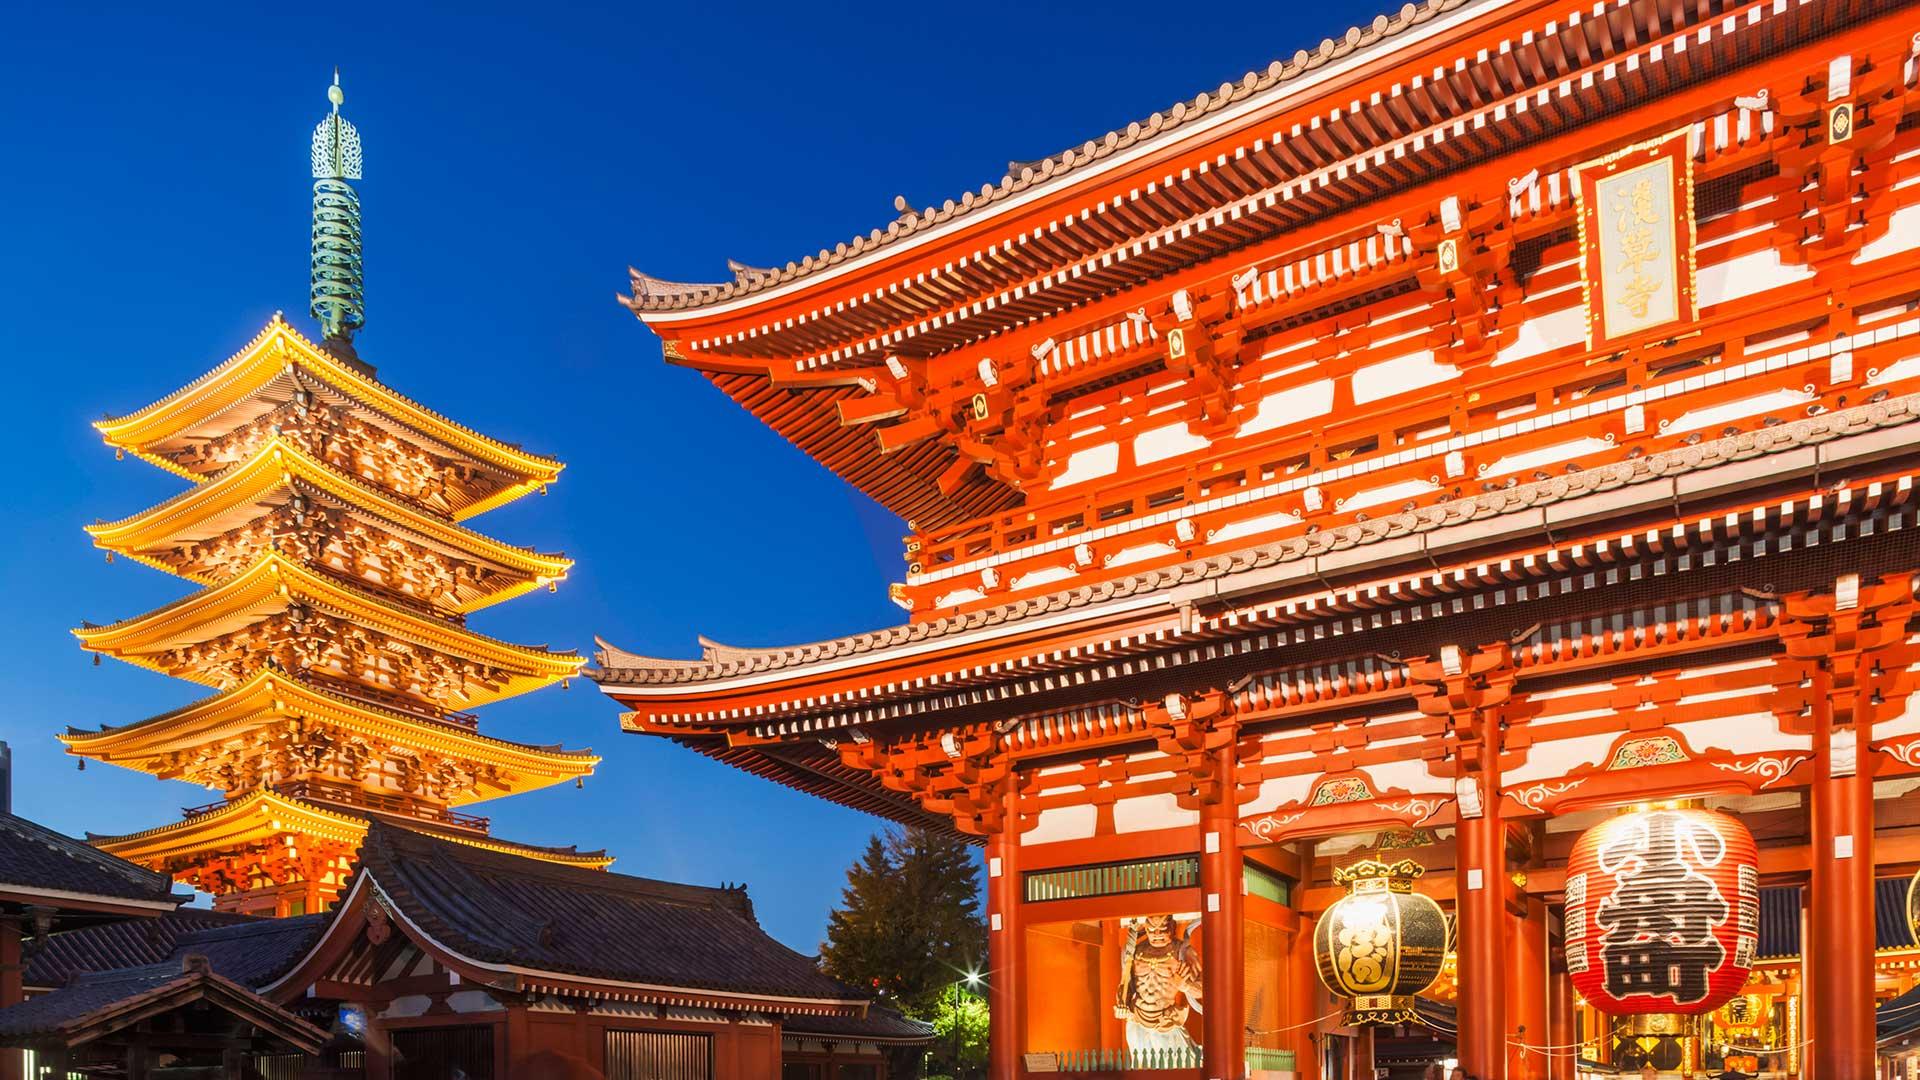 Asakusa, Sensoji Temple aka Asakusa Kannon Temple